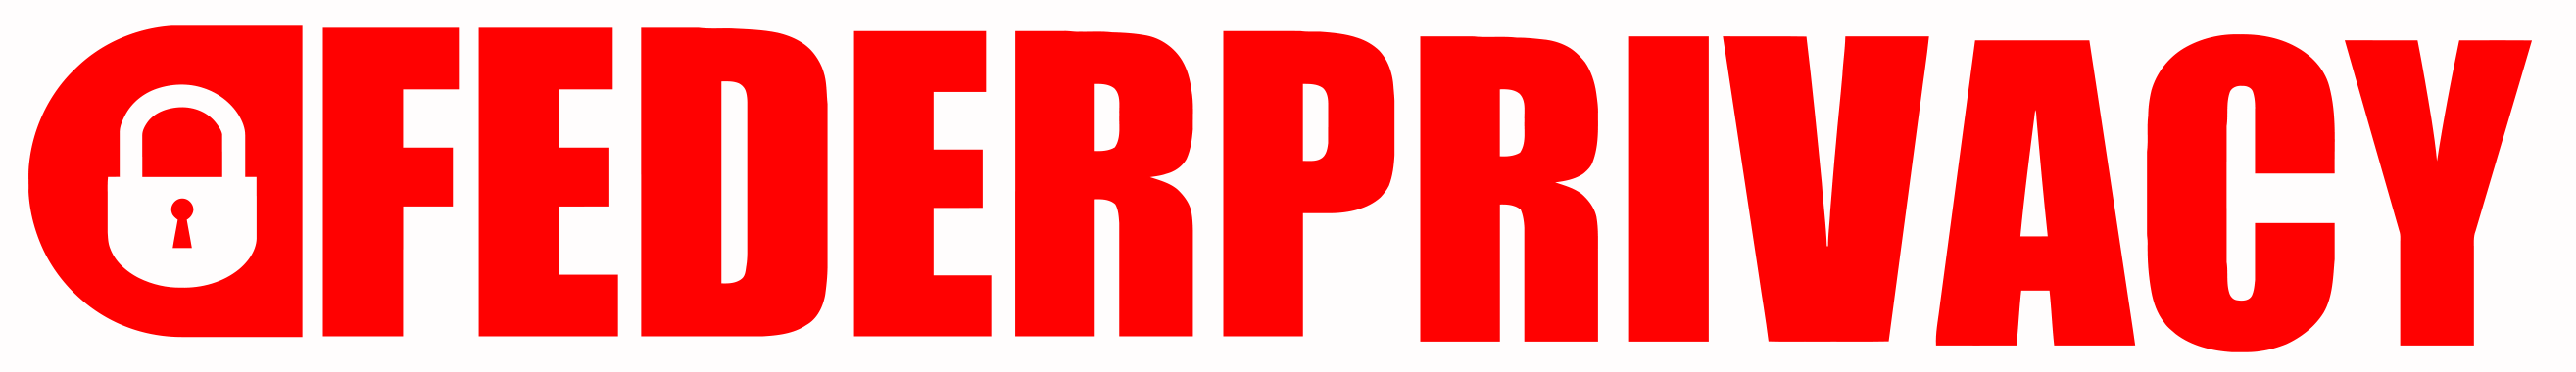 FederPrivacy